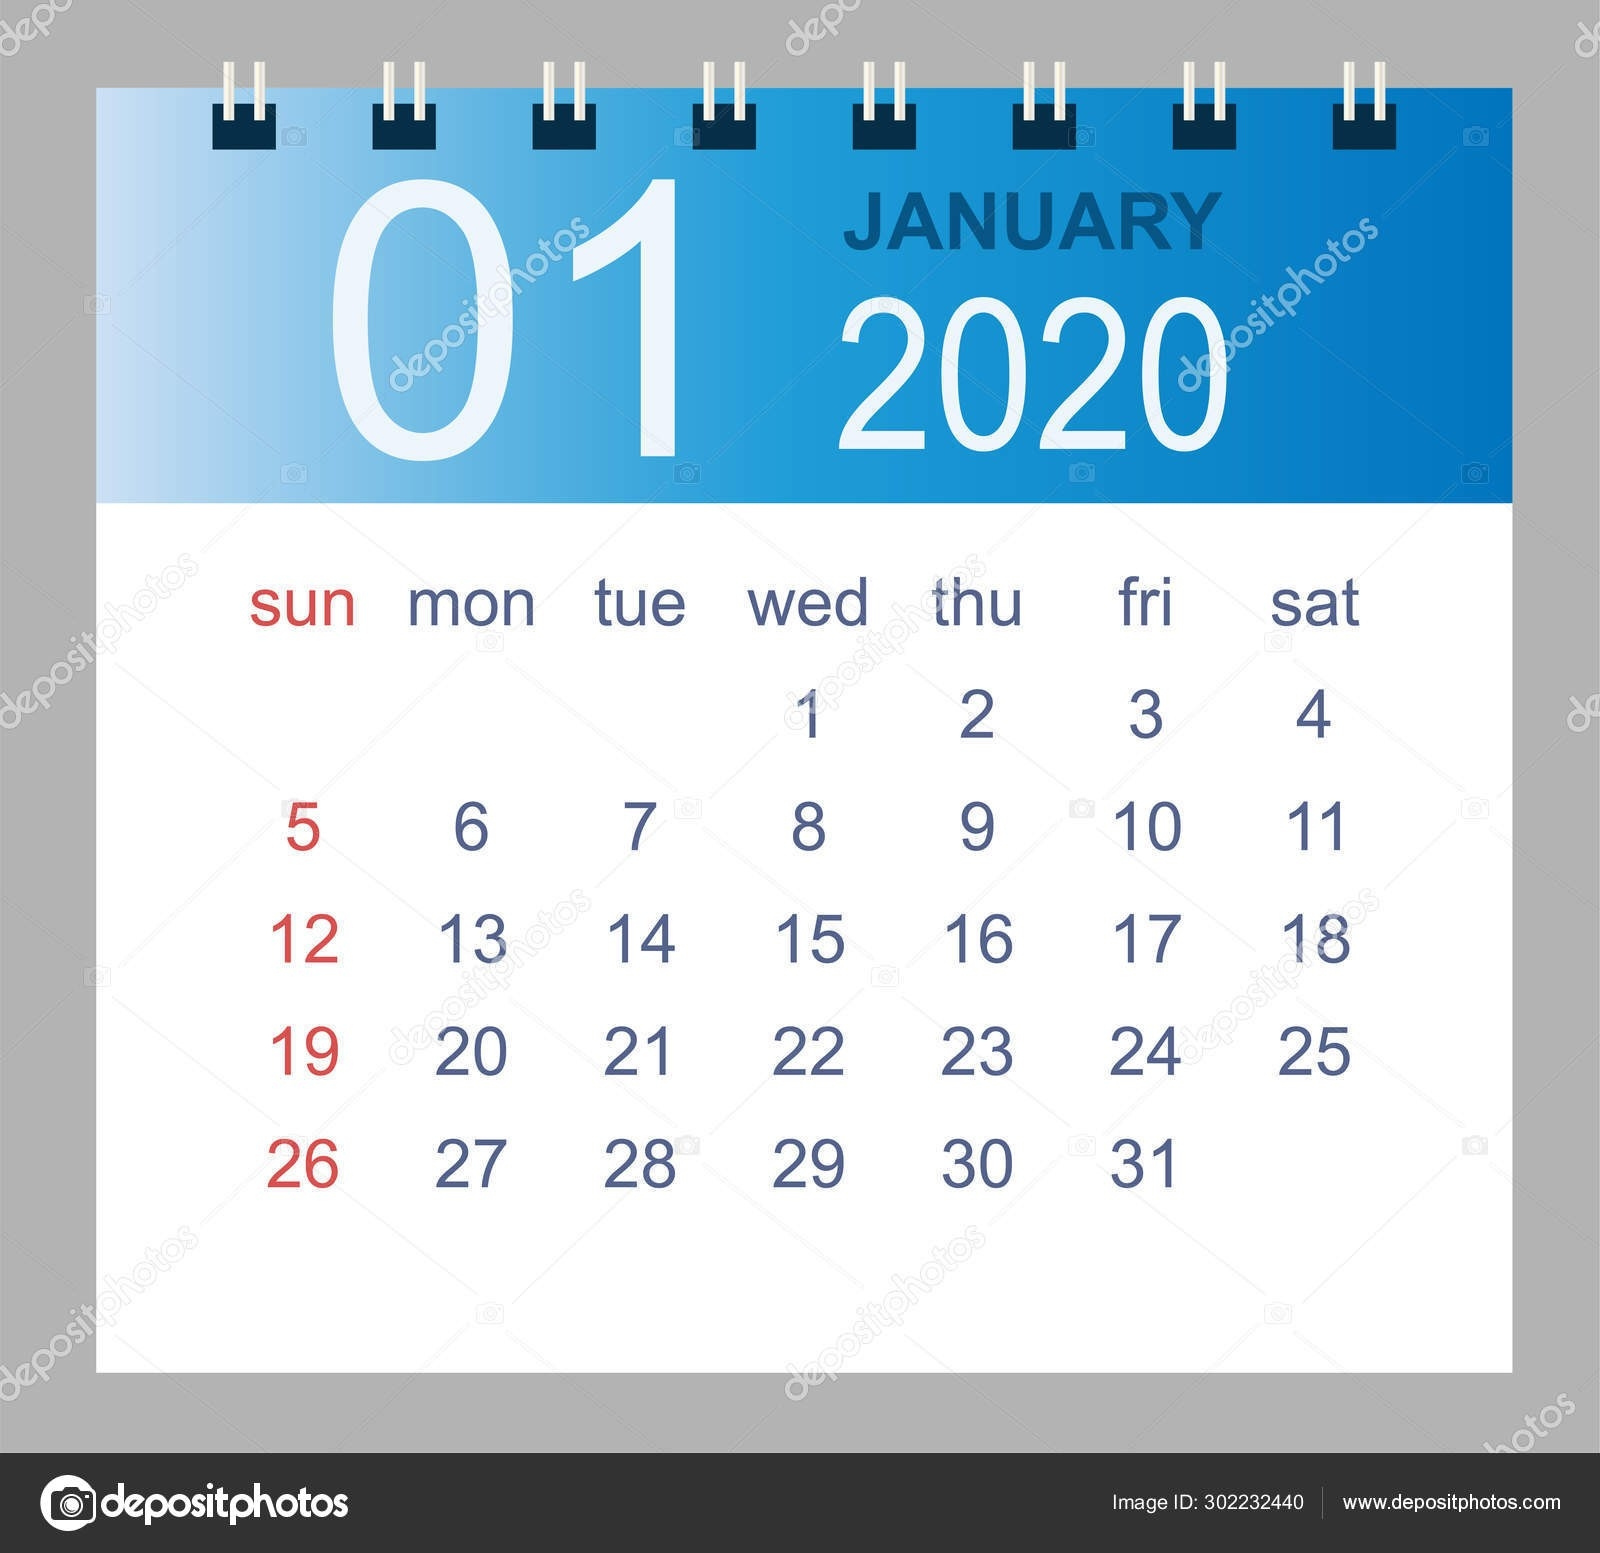 Simple Desk Calendar For January 2020. — Stock Vector © Olga-January 2020 Style 3 Calendar